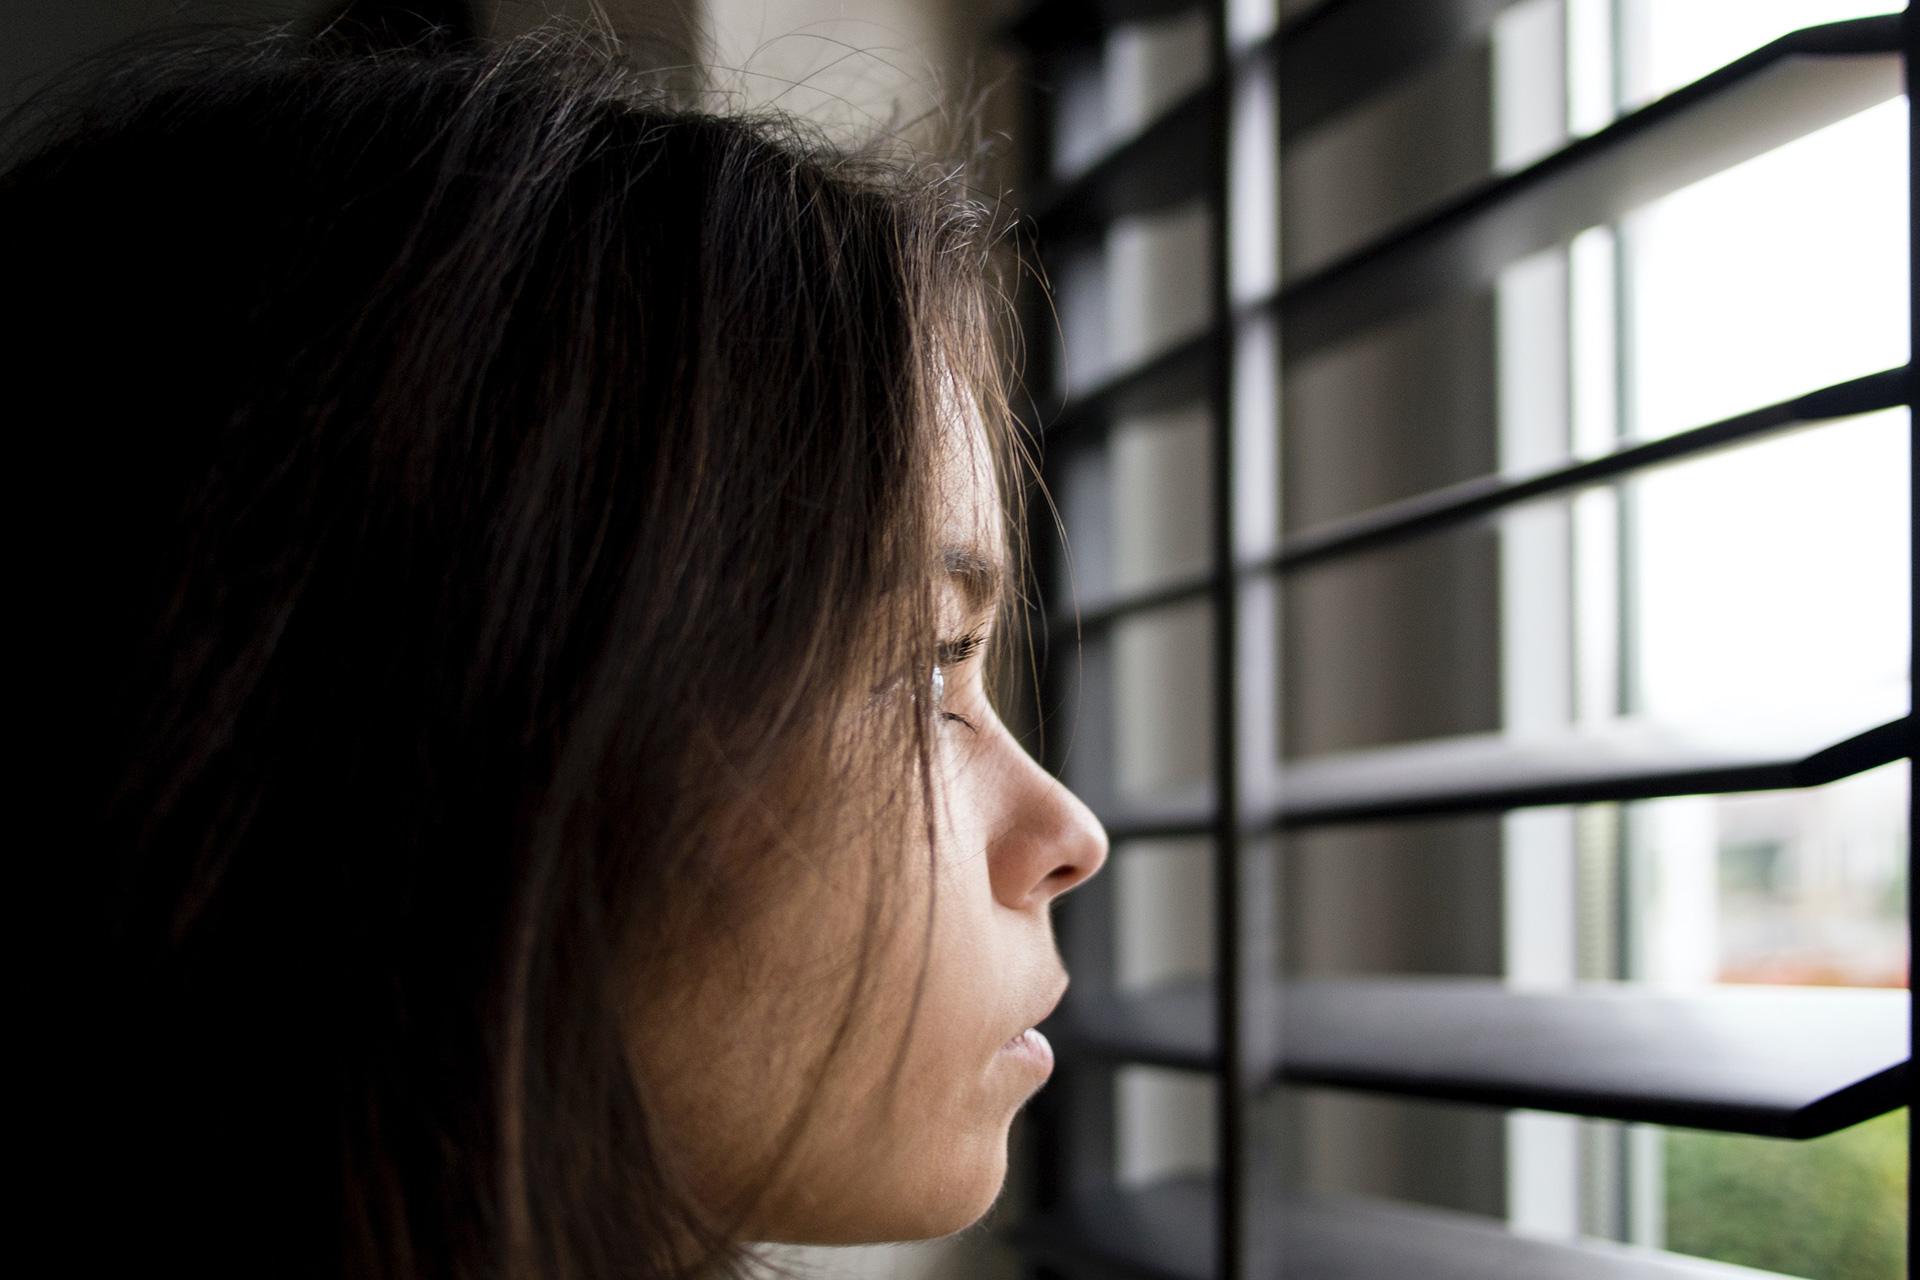 Avoidant Personality Disorder vs Social Anxiety